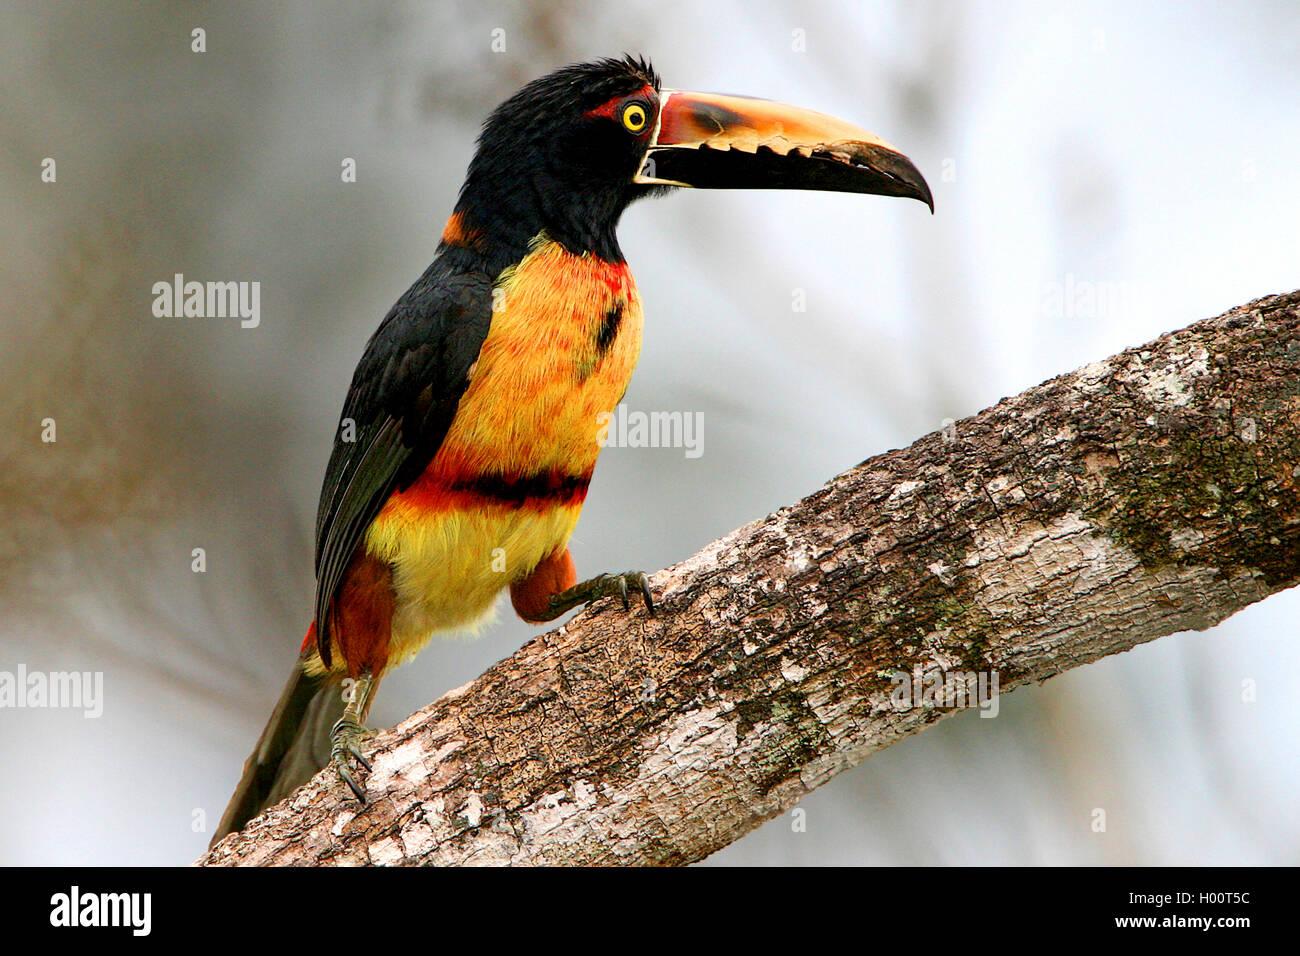 Halsbandarassari, Halsband-Arassari (Pteroglossus torquatus), sitzt auf einem Ast, Costa Rica   collared aracari - Stock Image